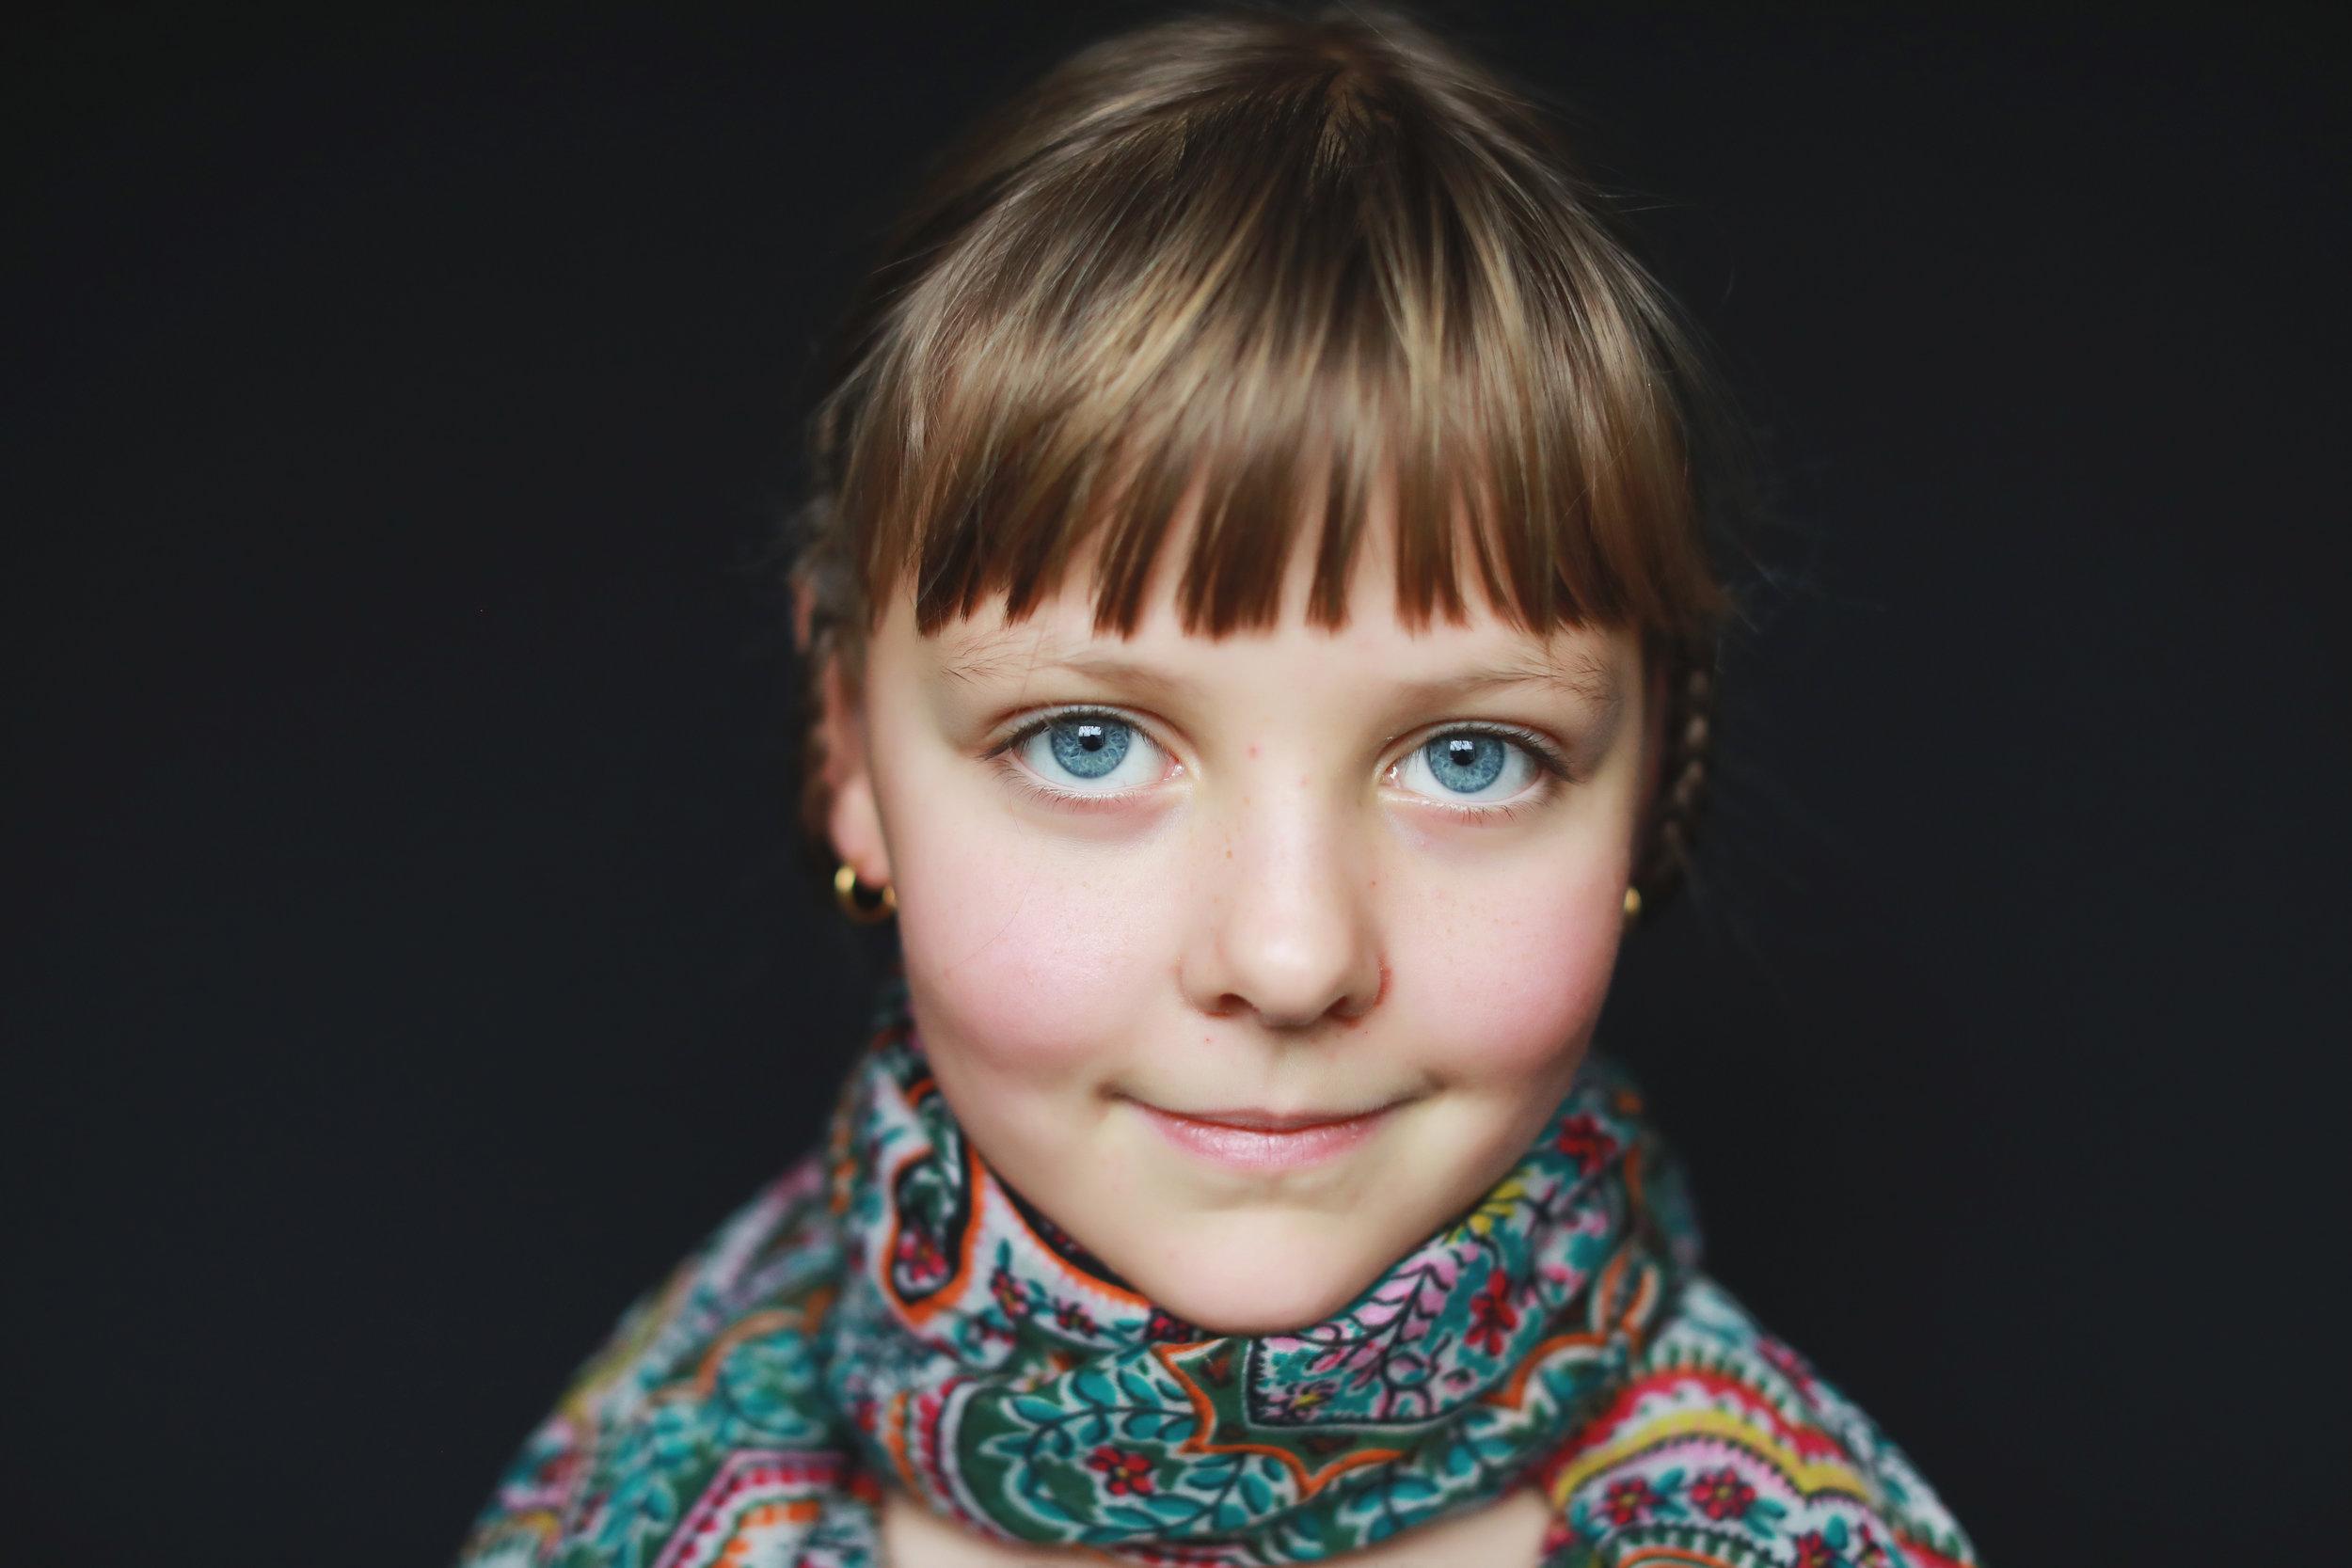 fine art boutique school photography seattle washington elena s blair